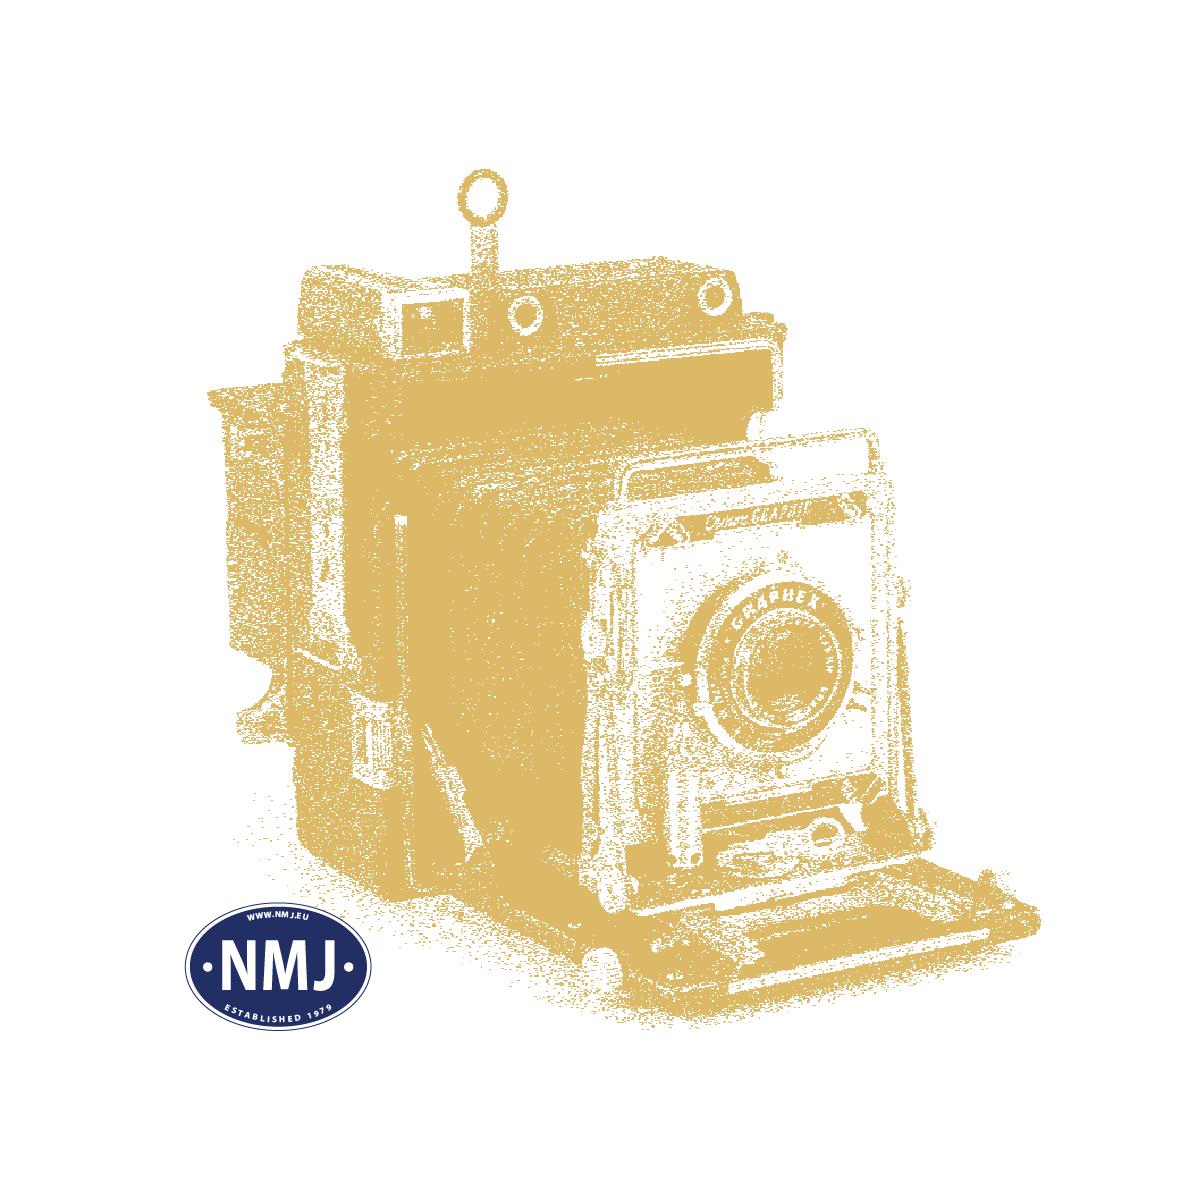 MBR55-1015 - Gressmatte #15, 30 x 40 Cm